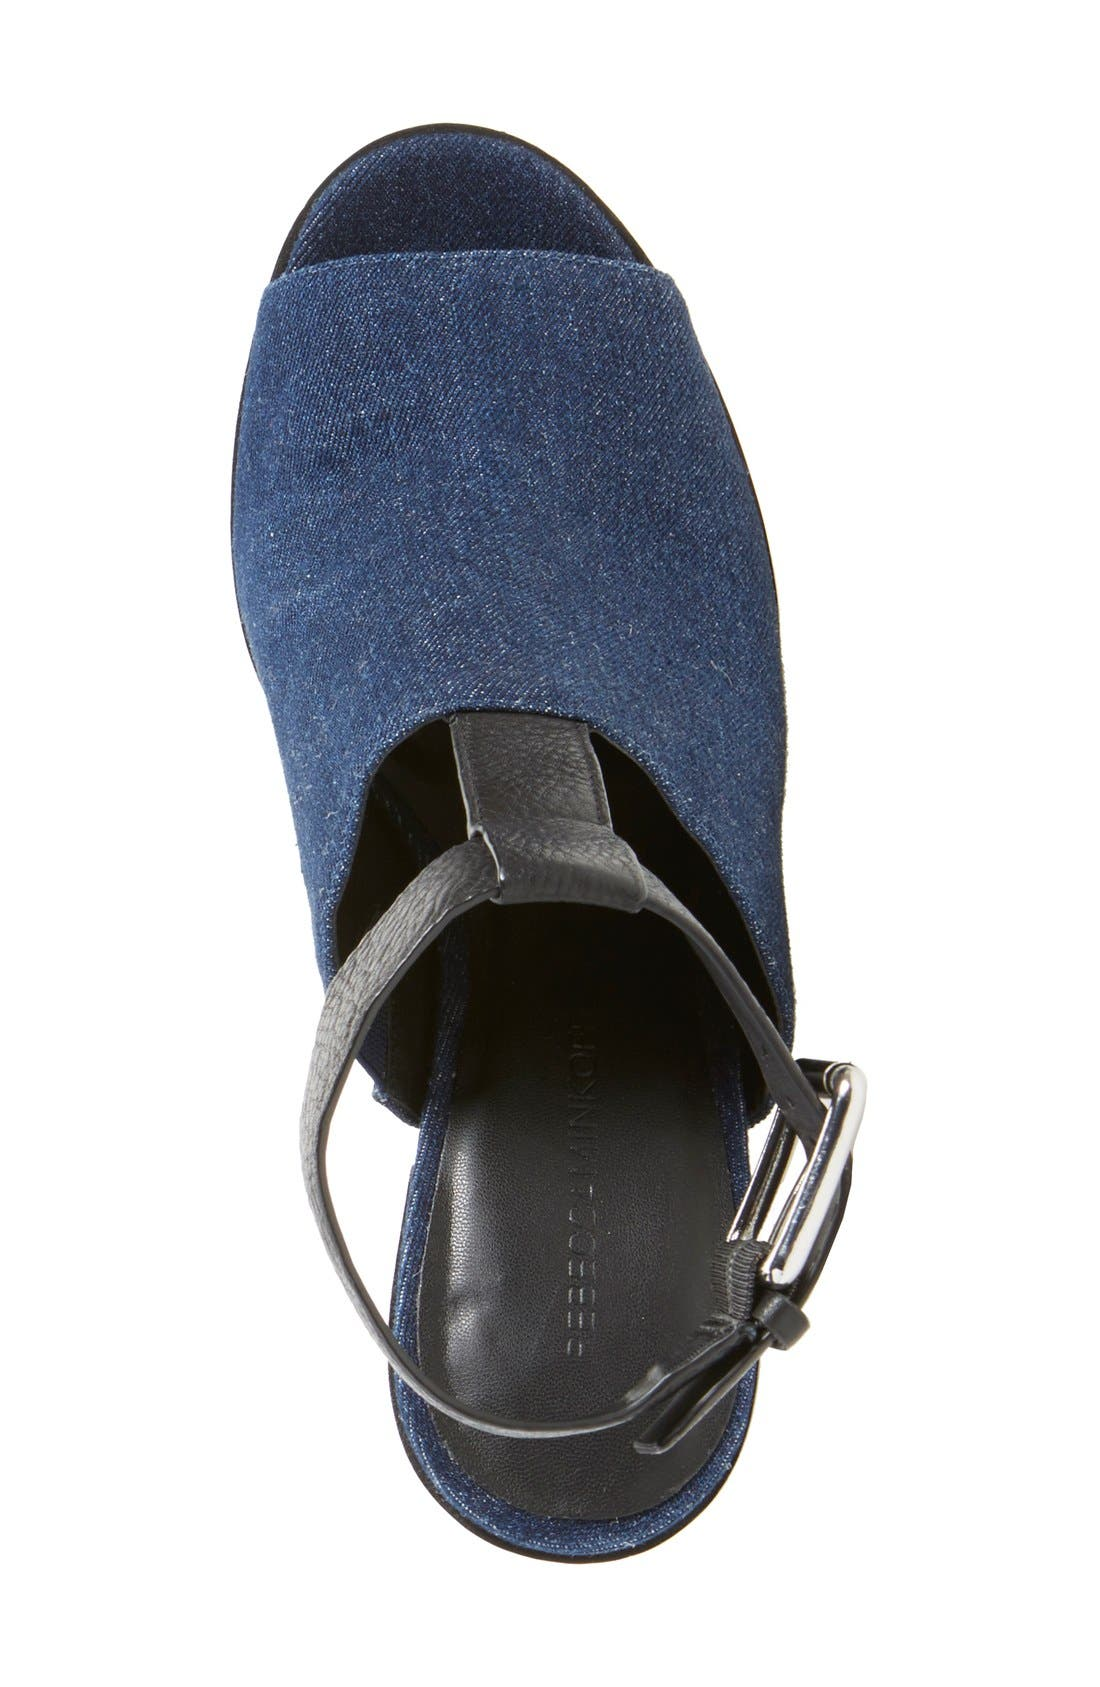 Alternate Image 3  - Rebecca Minkoff 'Cece' Platform Sandal (Women)